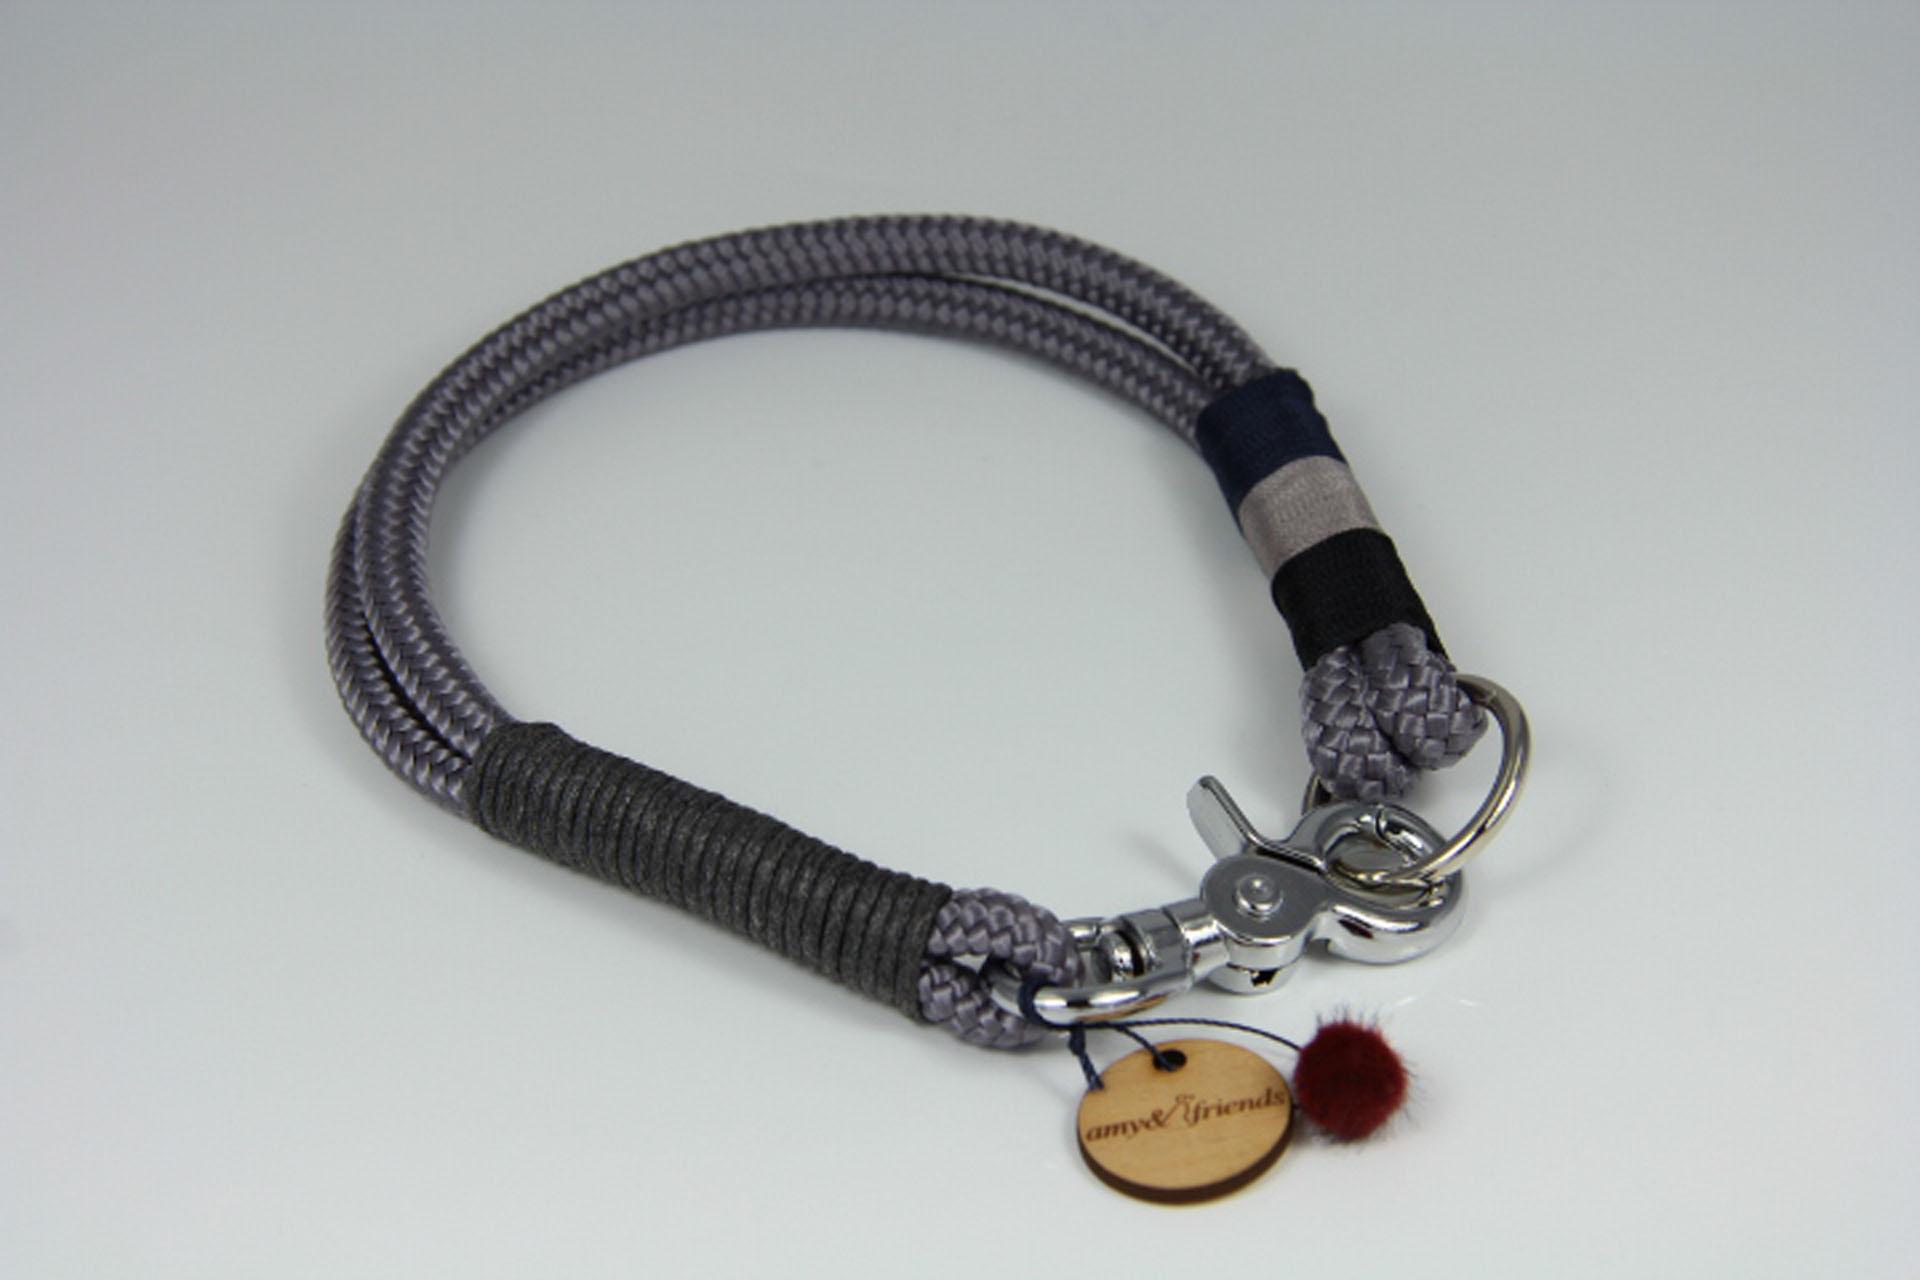 Tauhalsband-amy-and-friends-anthrazit-schwarz-grau-blaugrau